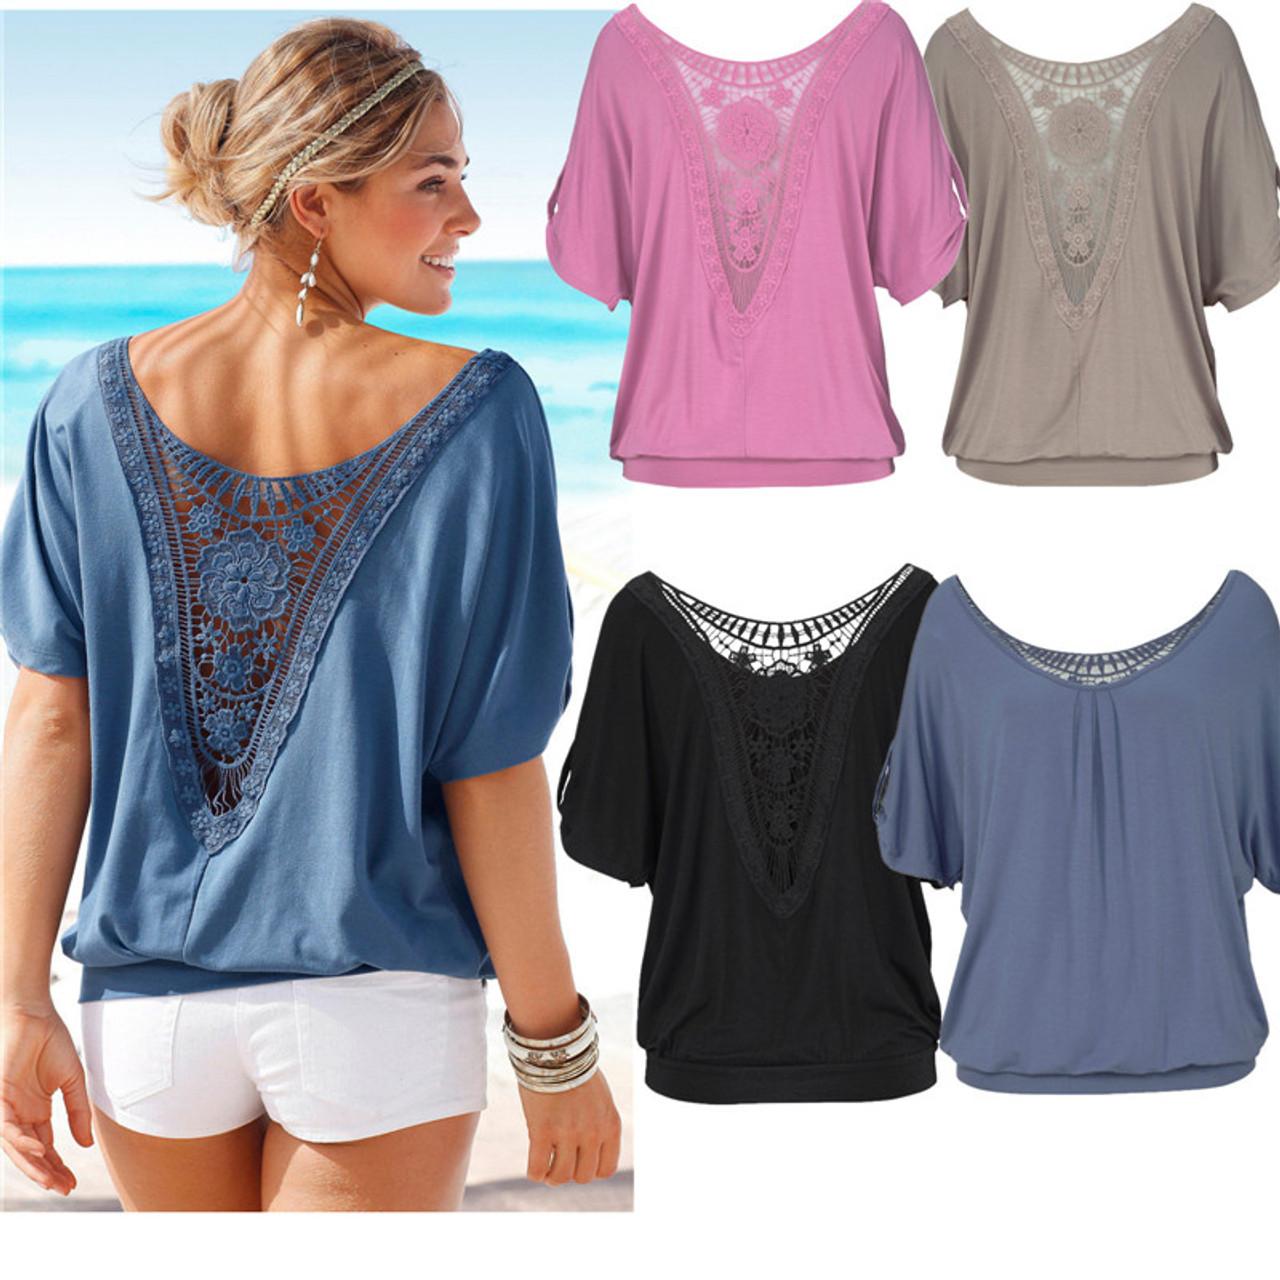 82ab027049bd ... Fashion T Shirt Women Plus Size XXXXL 5XL Summer Casual 0-Neck Top Tee  Harajuku ...